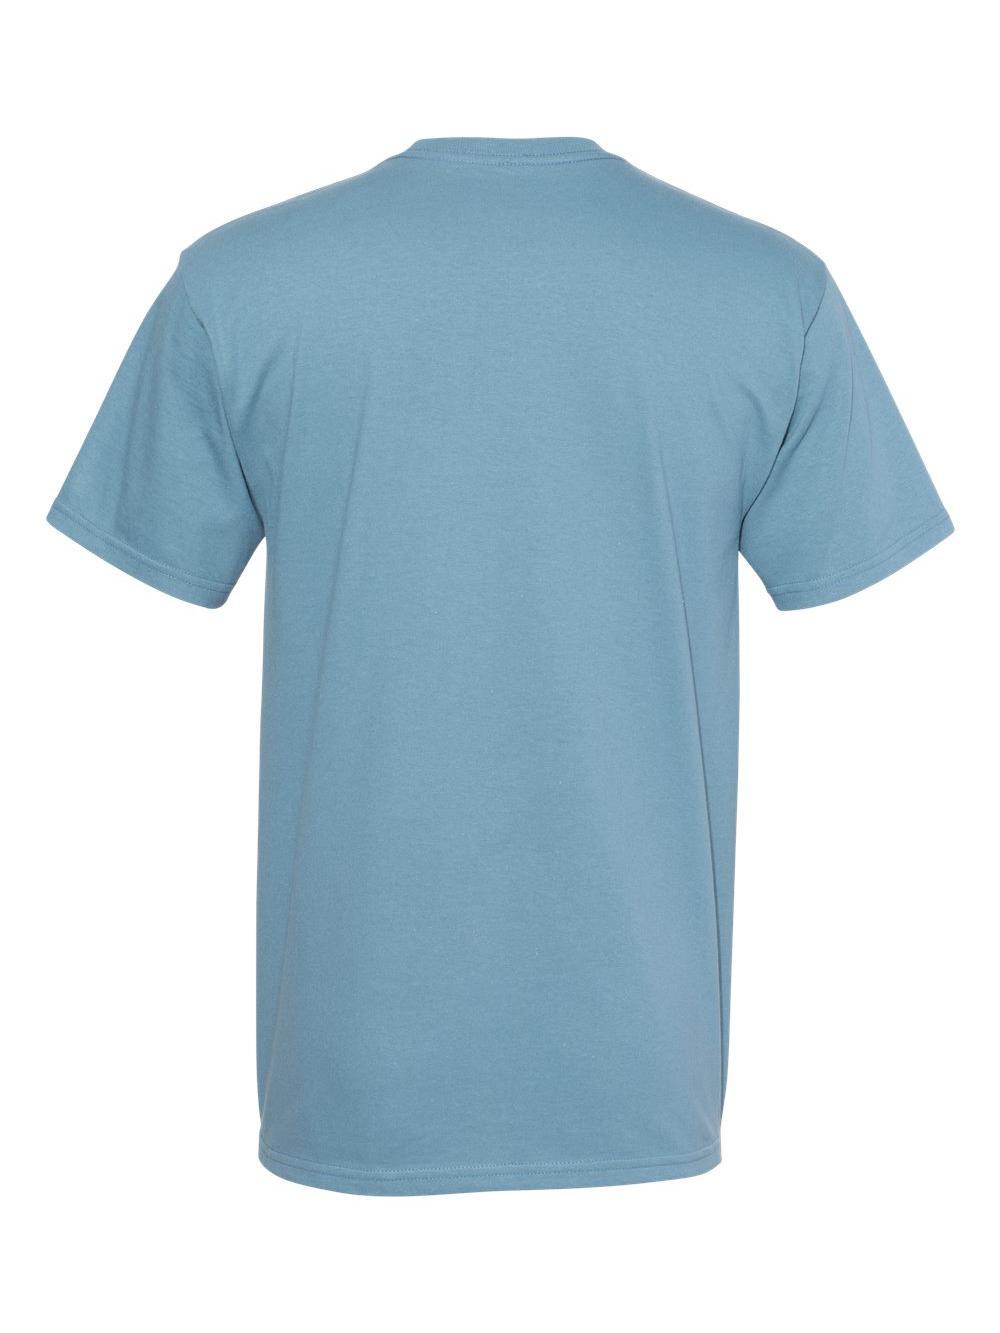 ALSTYLE-Premium-T-Shirt-1701 thumbnail 62